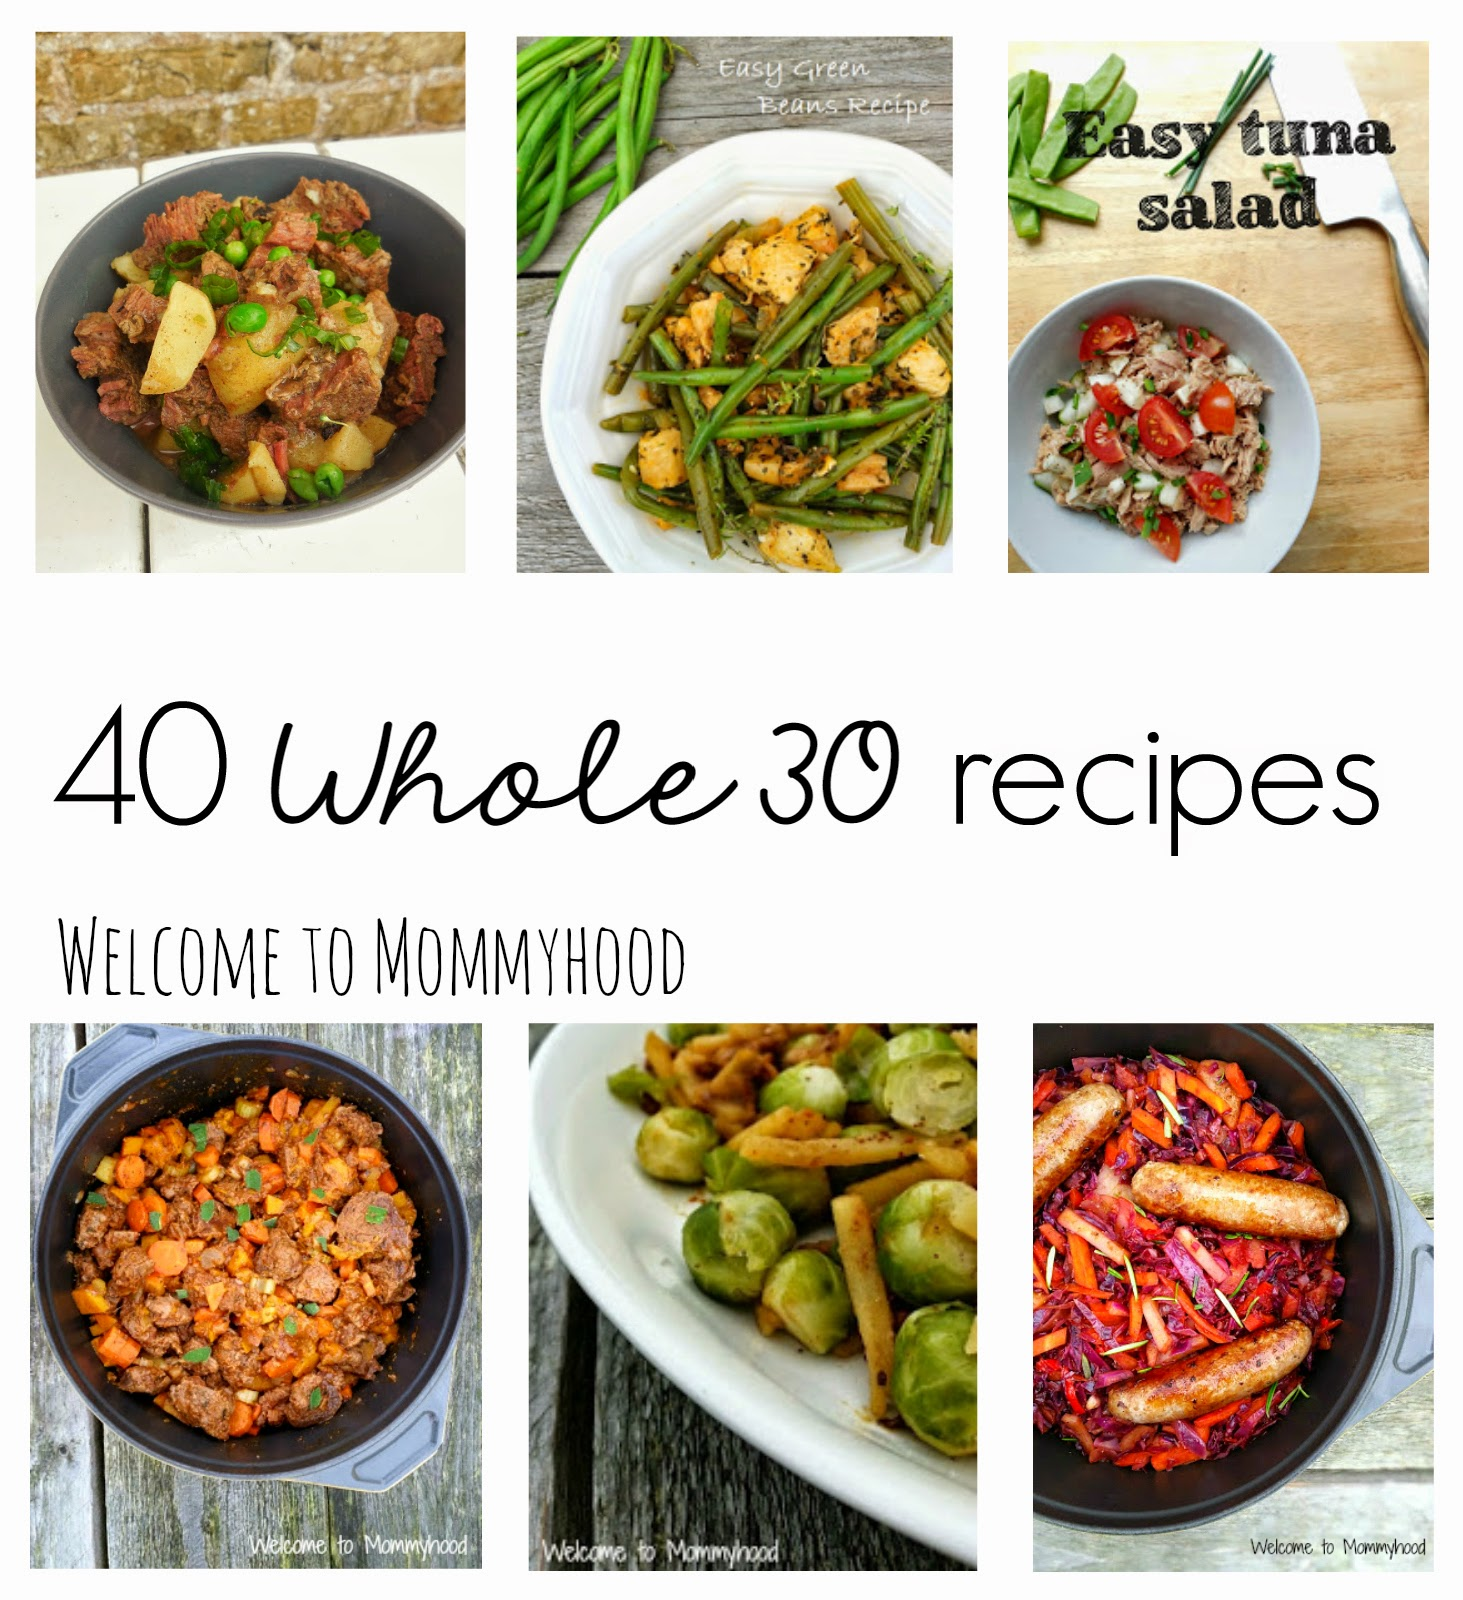 Welcome to Mommyhood: Whole 30 recipes #paleo, #whole30